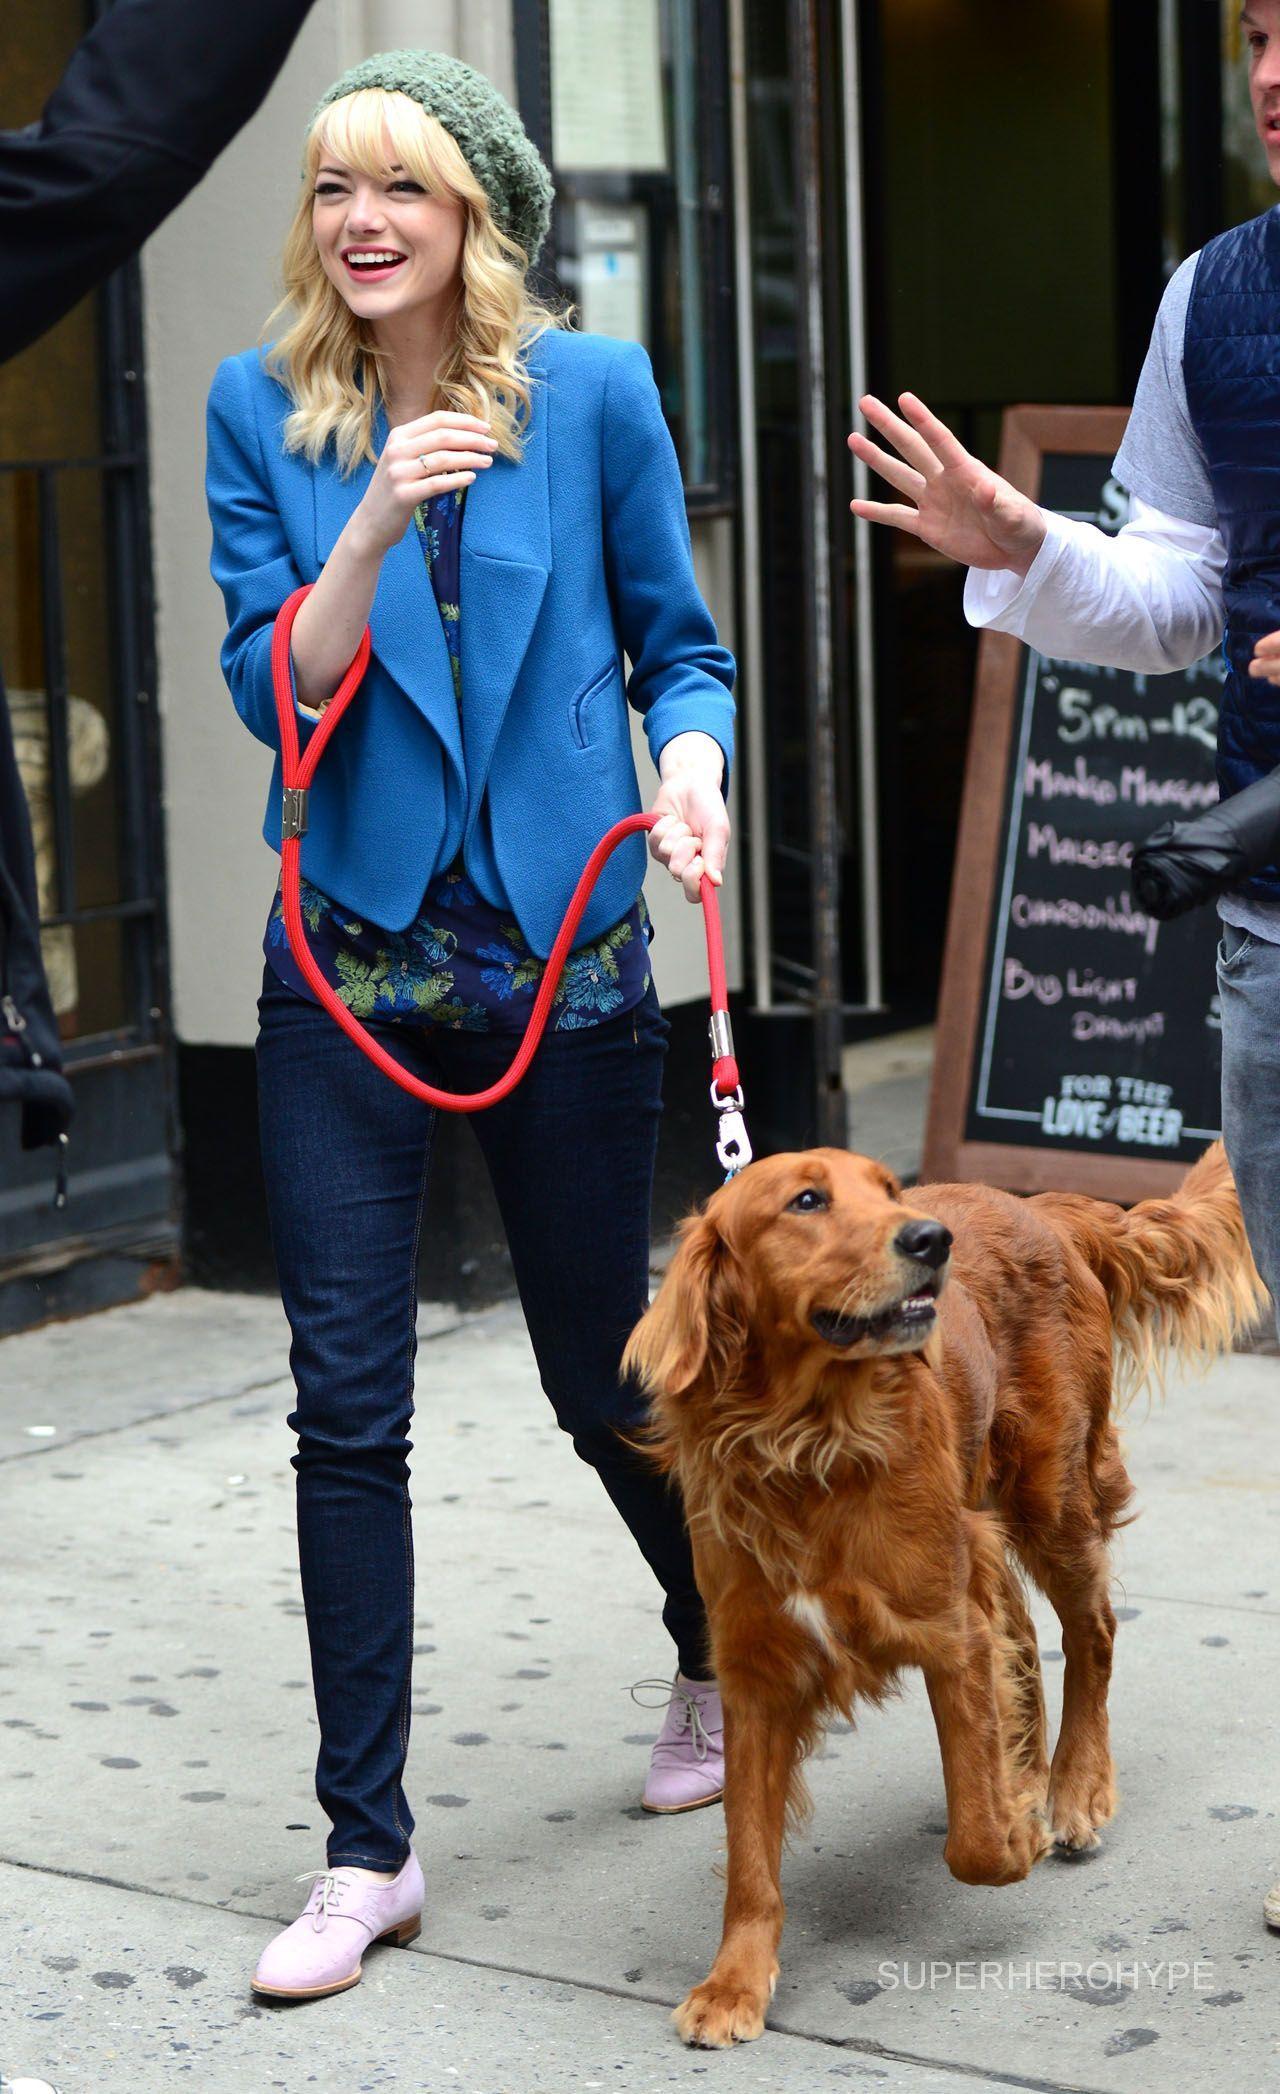 15 Celebrity Dog Moms Who Make Crazy Dog Lady Look Pretty Darn